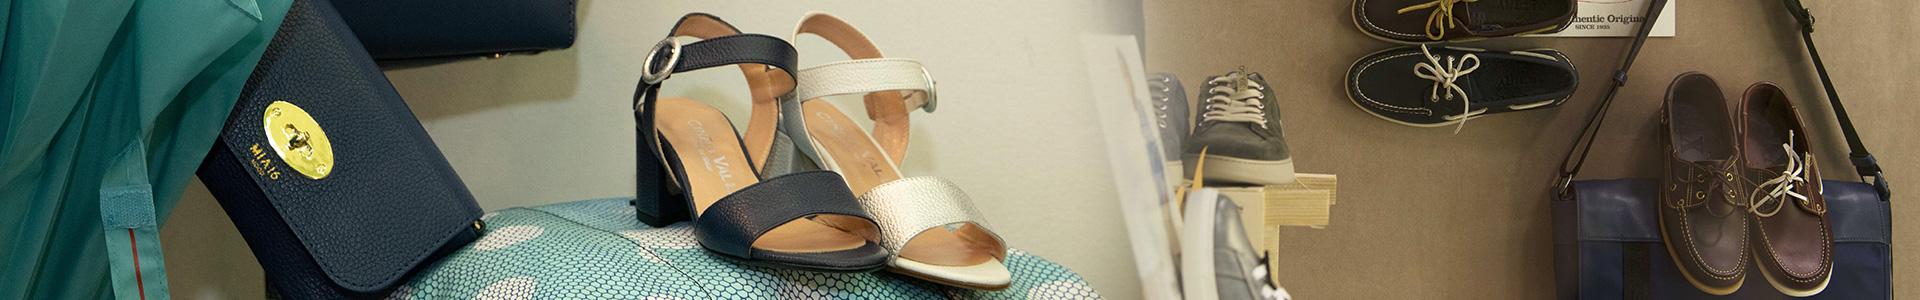 scarpe pelle Panfili